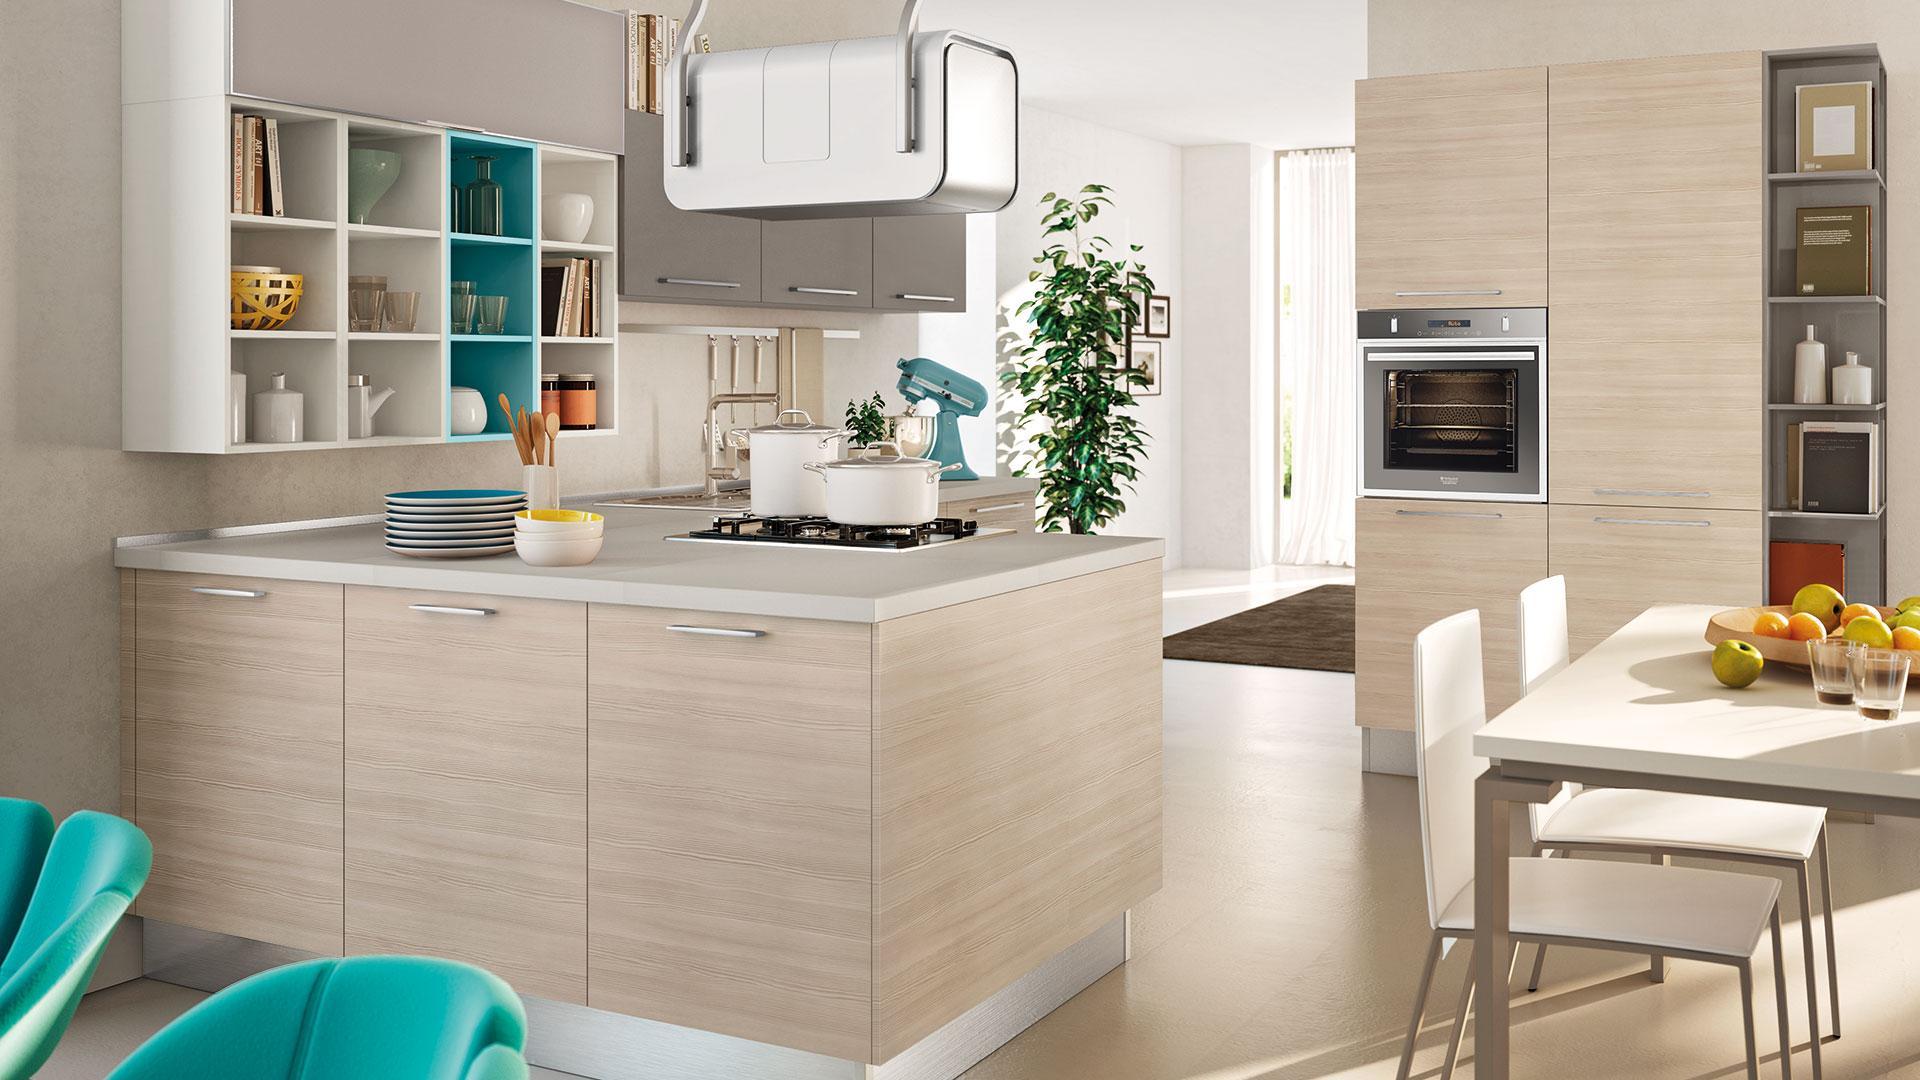 I consigli per arredare una cucina quadrata senza errori - Arredare una cucina moderna ...